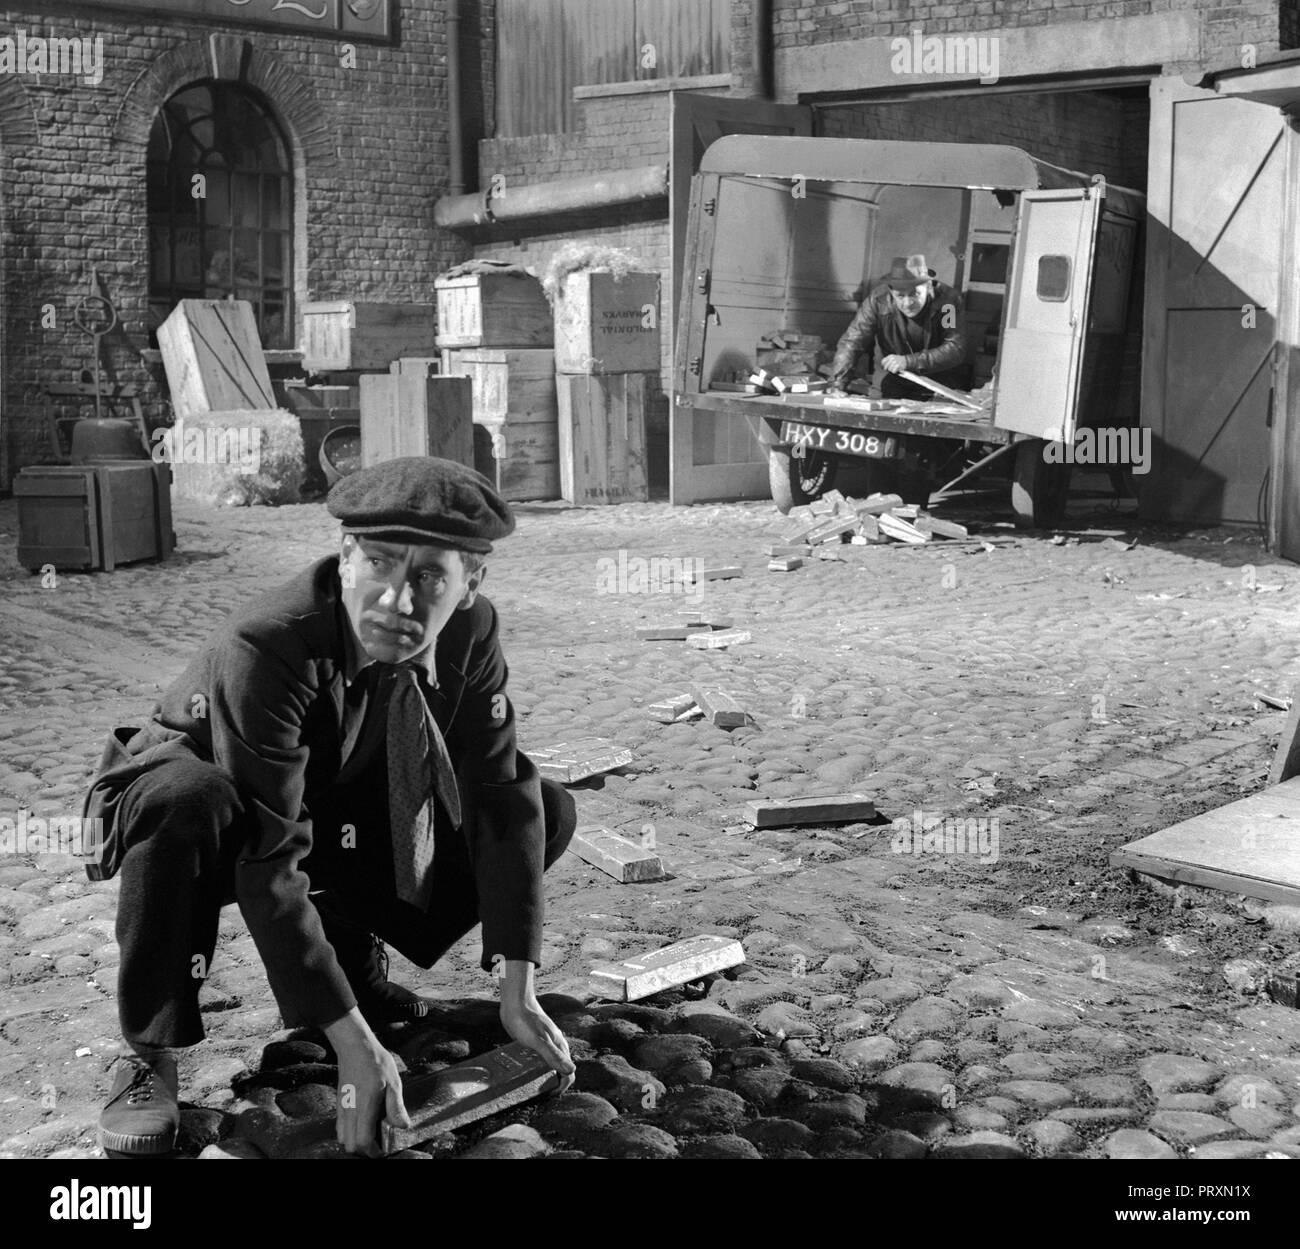 Prod DB © Rank Organisation / DR DE L'OR EN BARRES THE LAVENDER HILL MOB de Charles Crichton 1951 GB Alfie Bass. lingot d'or; gold bar code Rank 738 - Stock Image